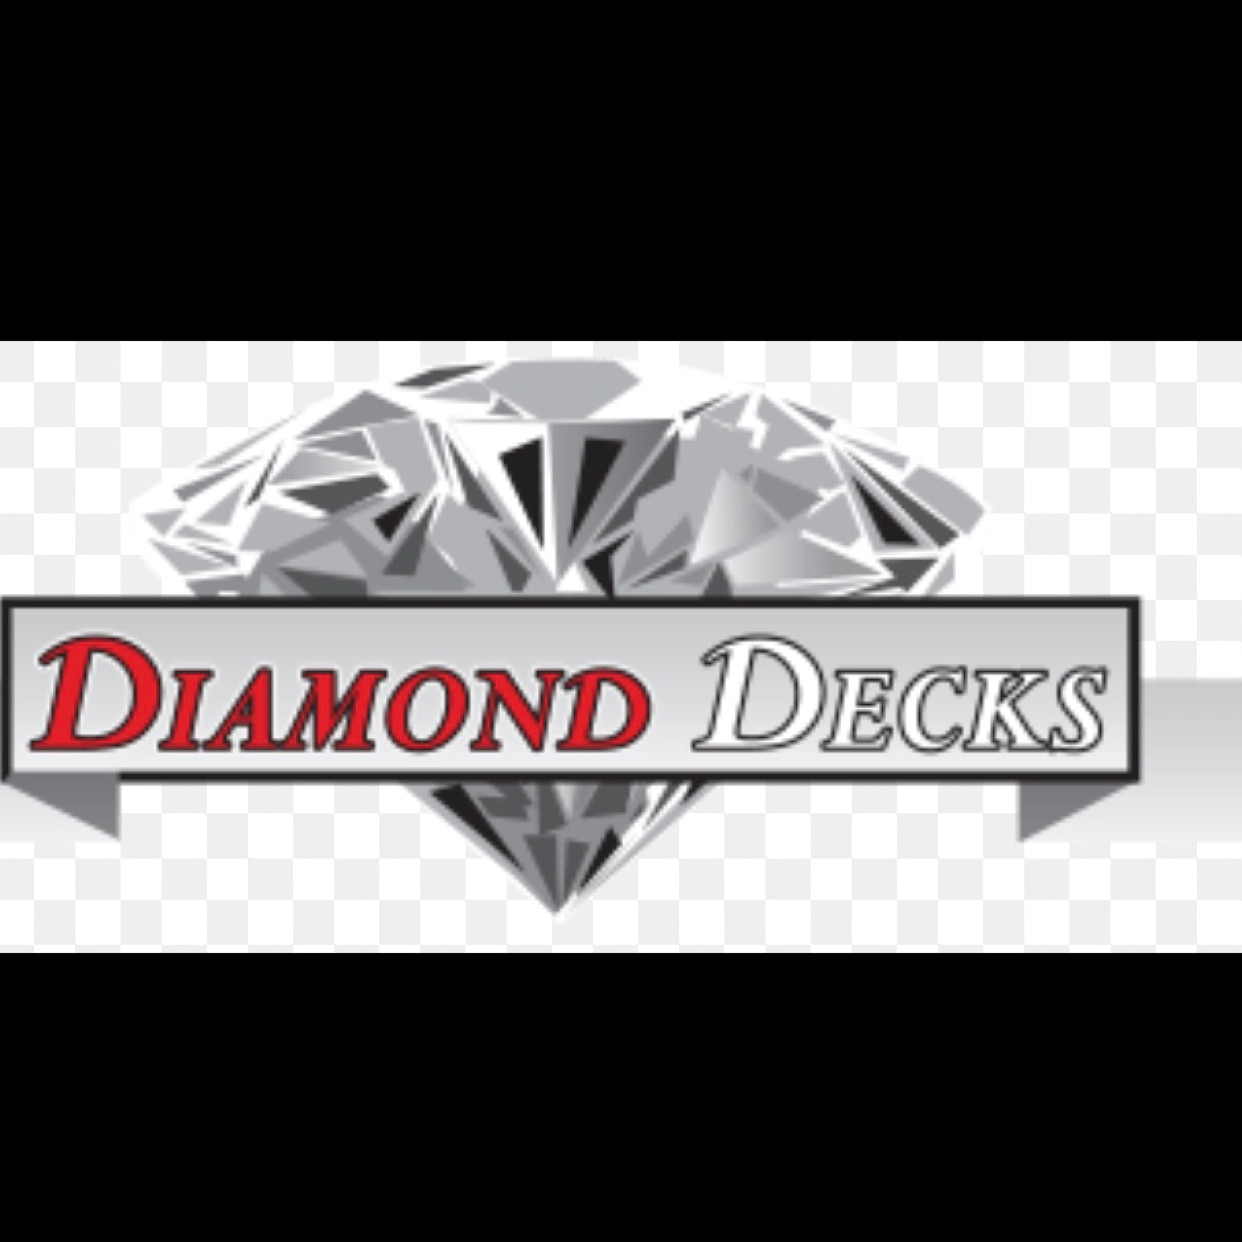 Diamond Decks logo